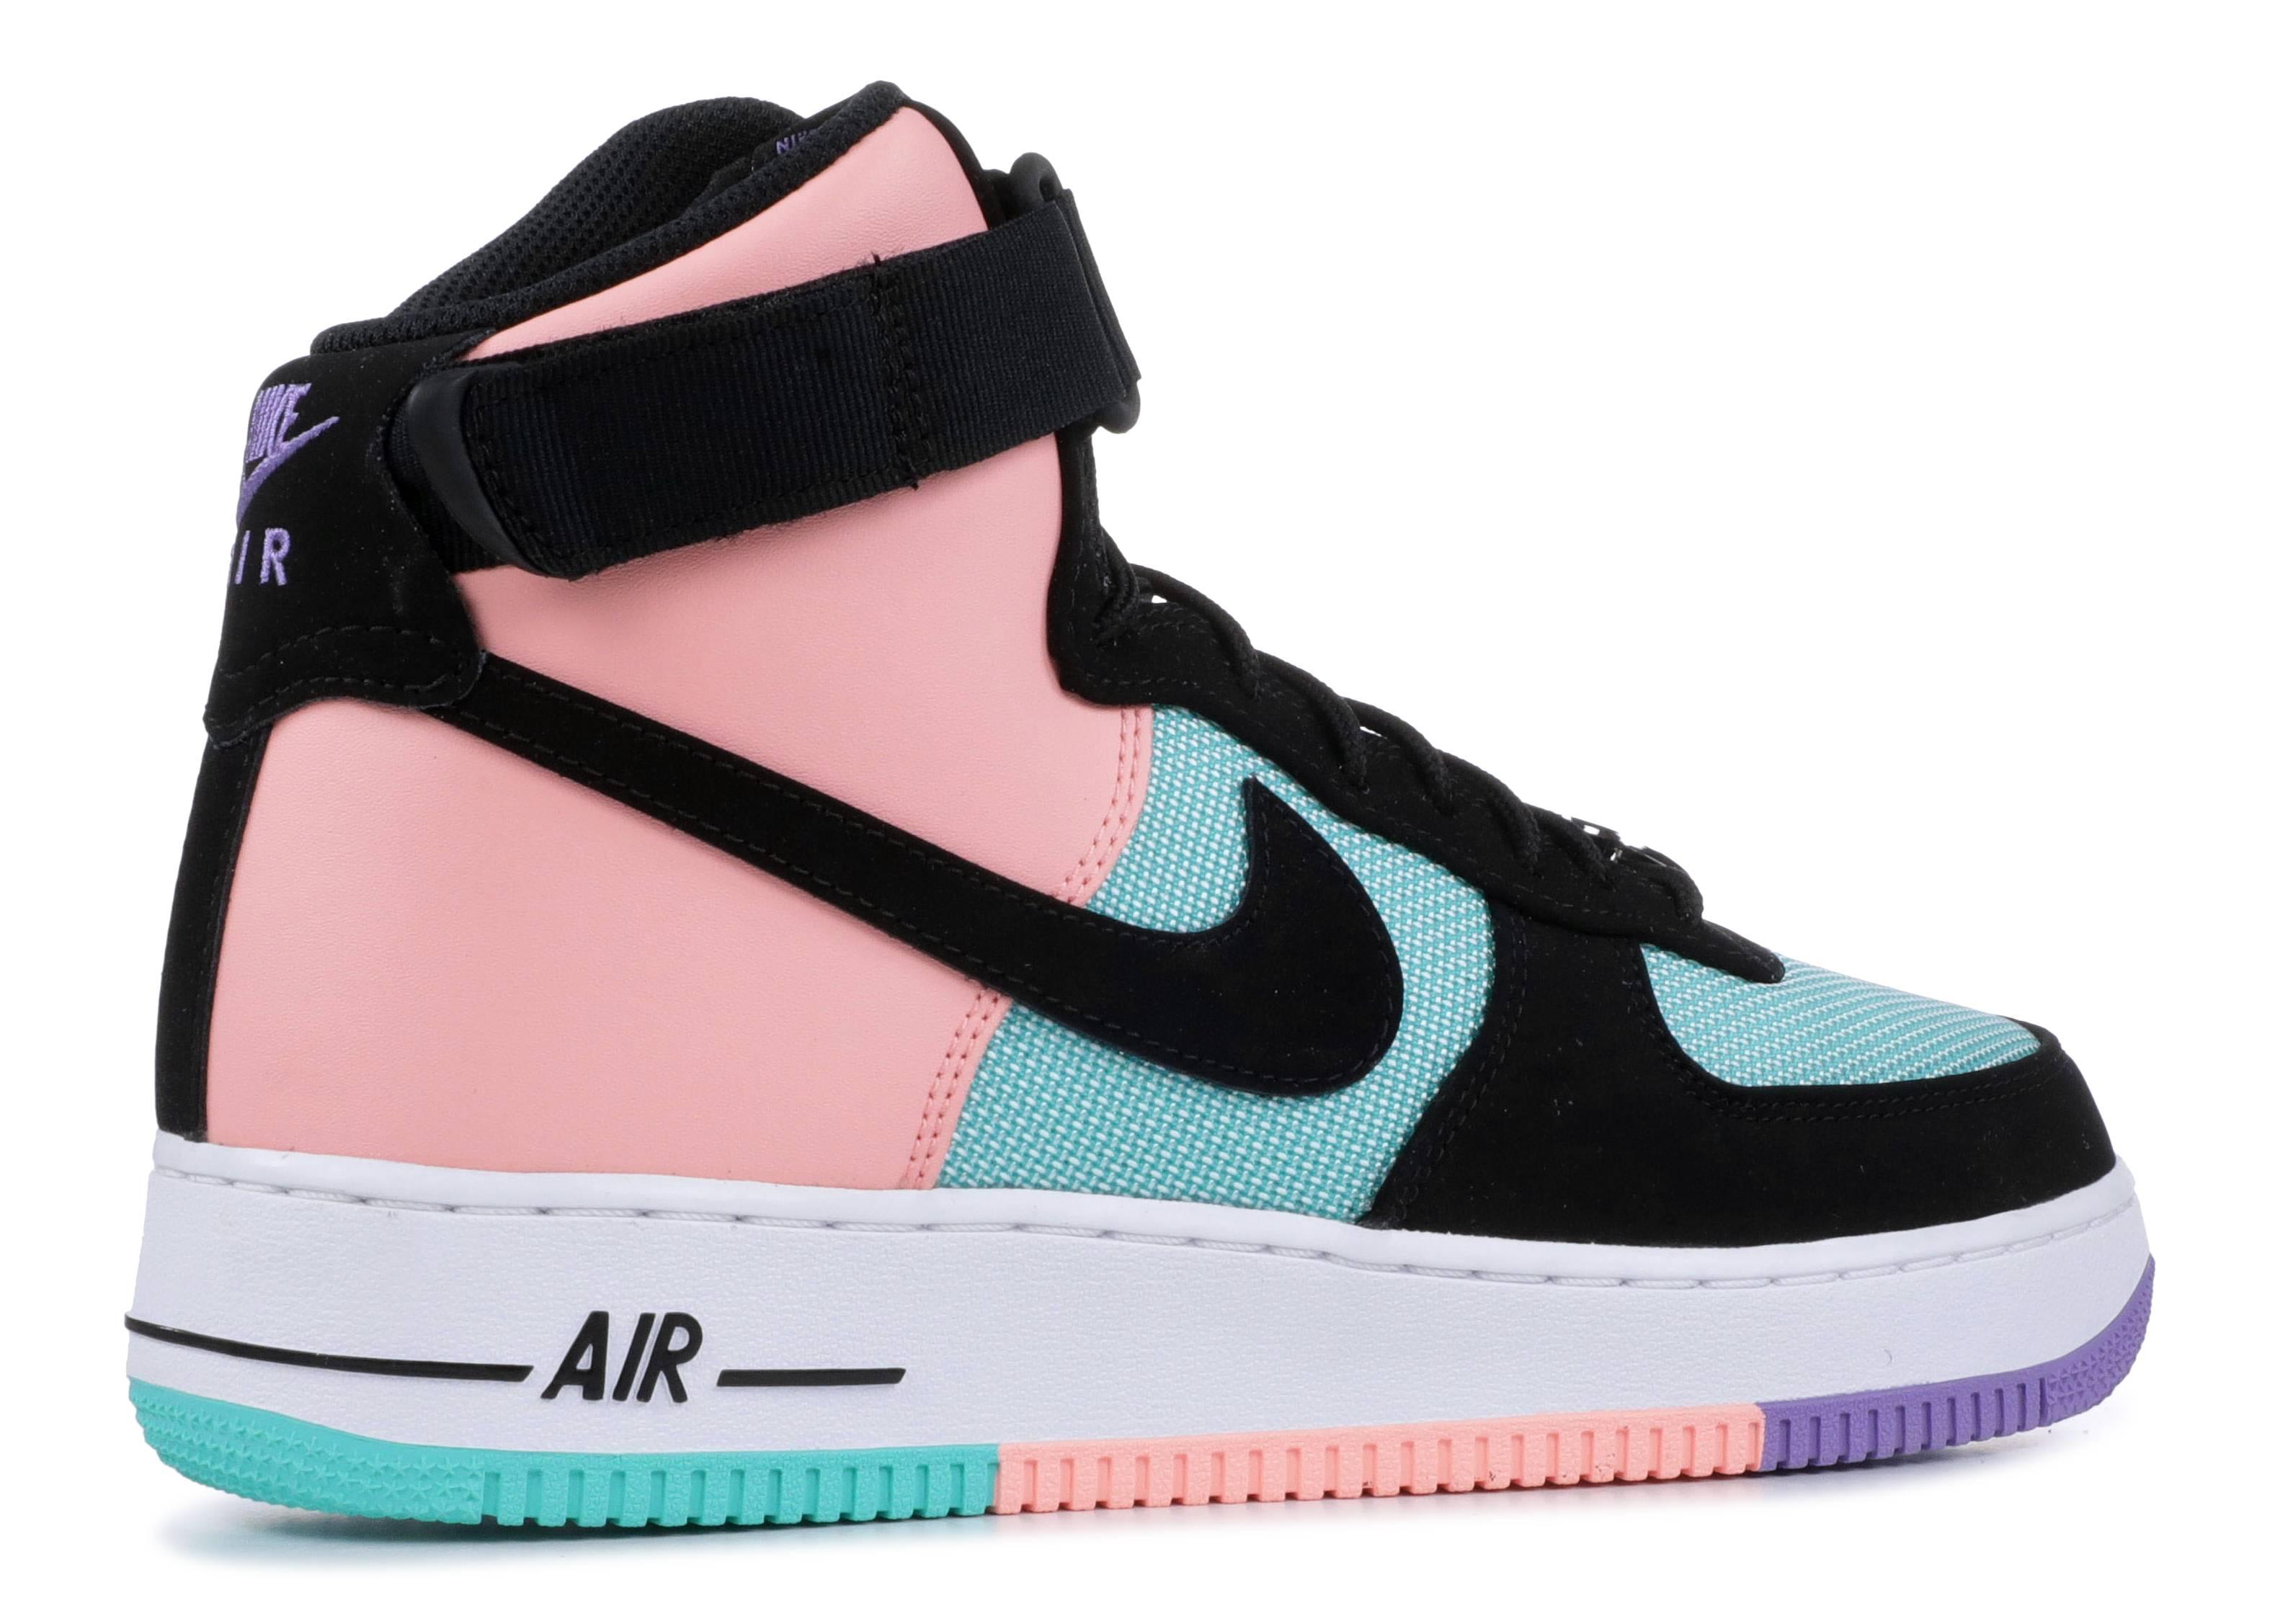 voluntario Trueno De alguna manera  Air Force 1 High 'Have A Nike Day' - Nike - CI2306 300 - hyper  jade/bleached coral-space purple-black | Flight Club